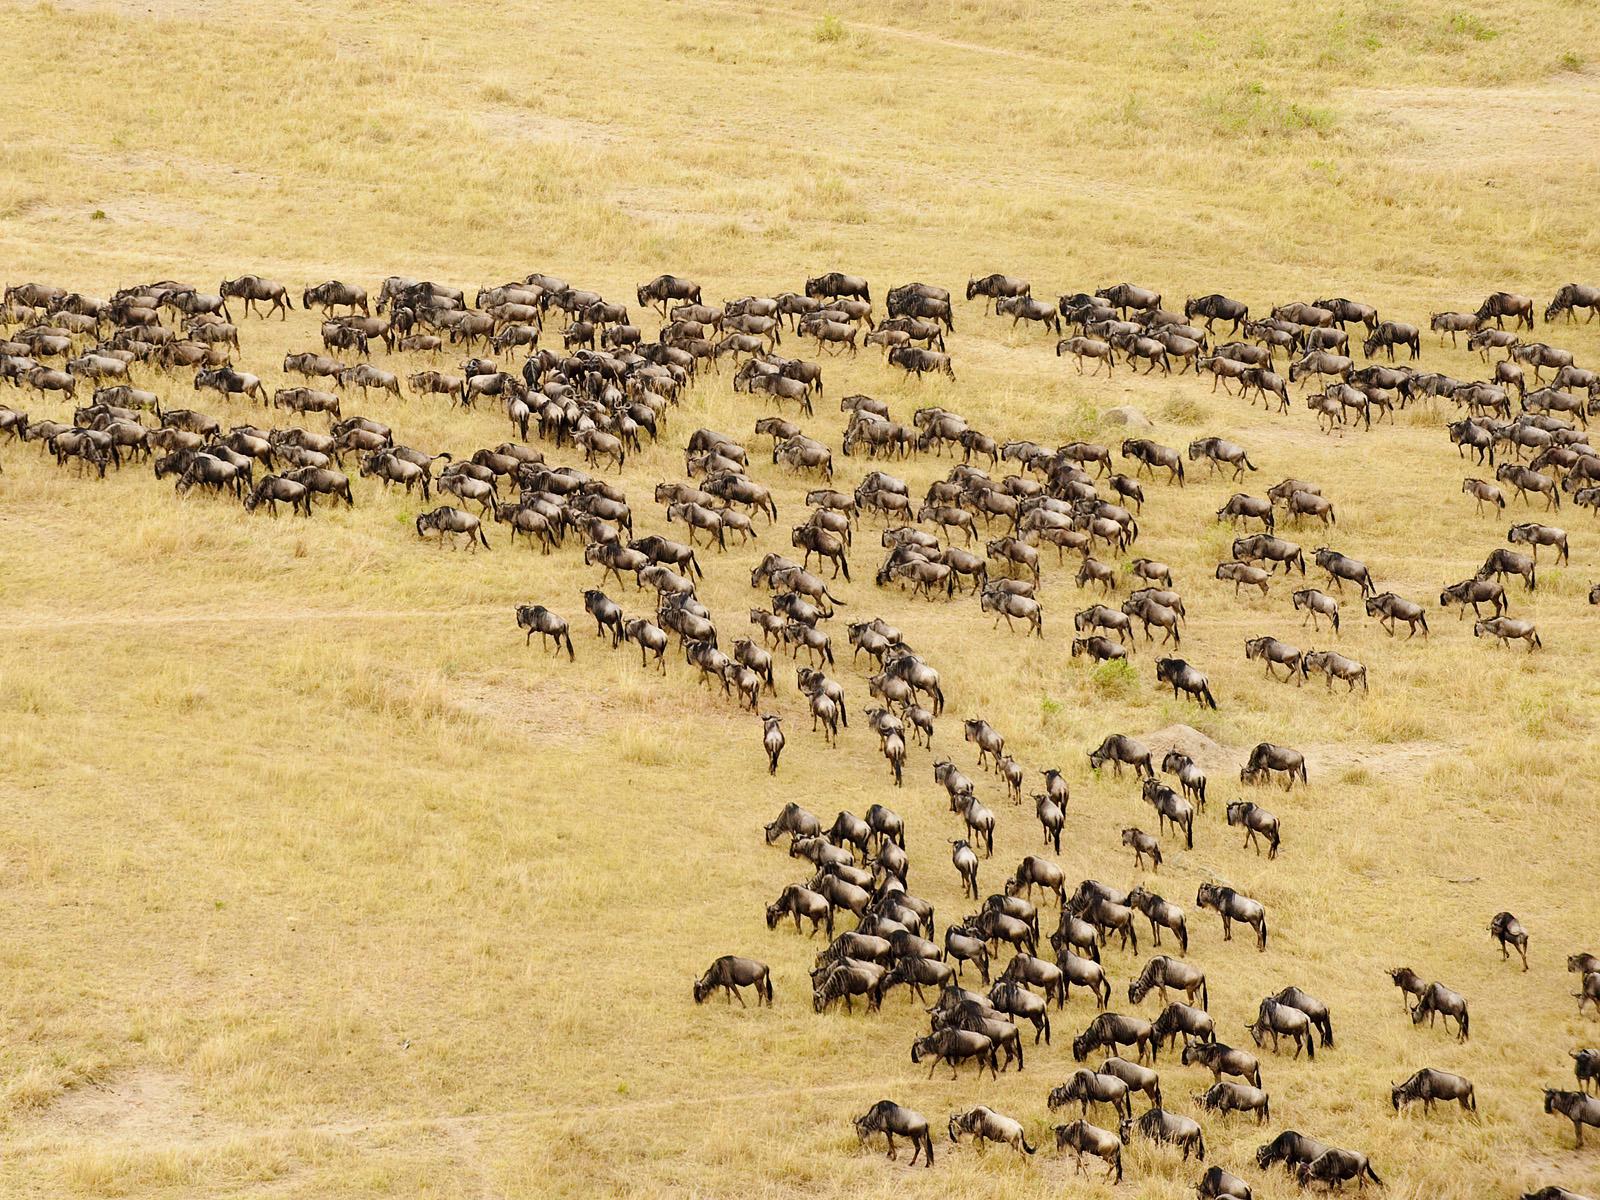 3 Days Masai Mara Migration Tour in 2015, Three (3) Days Masai ...